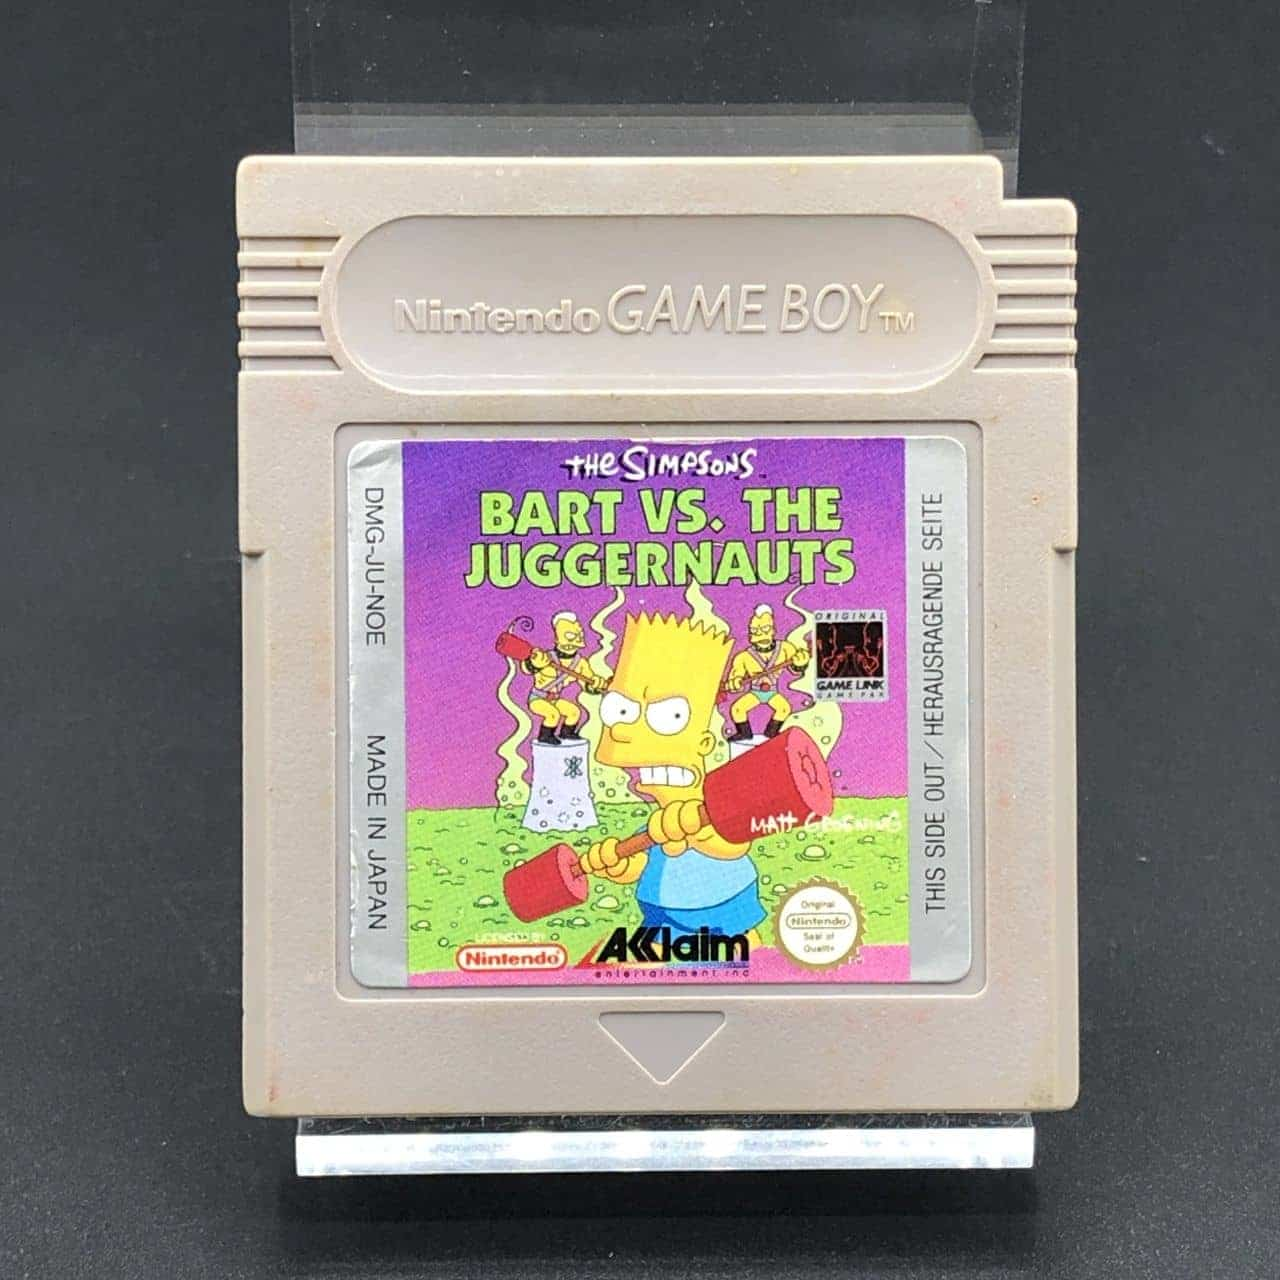 GB The Simpsons: Bart vs. The Juggernauts (Modul) (Gebrauchsspuren) Nintendo Game Boy